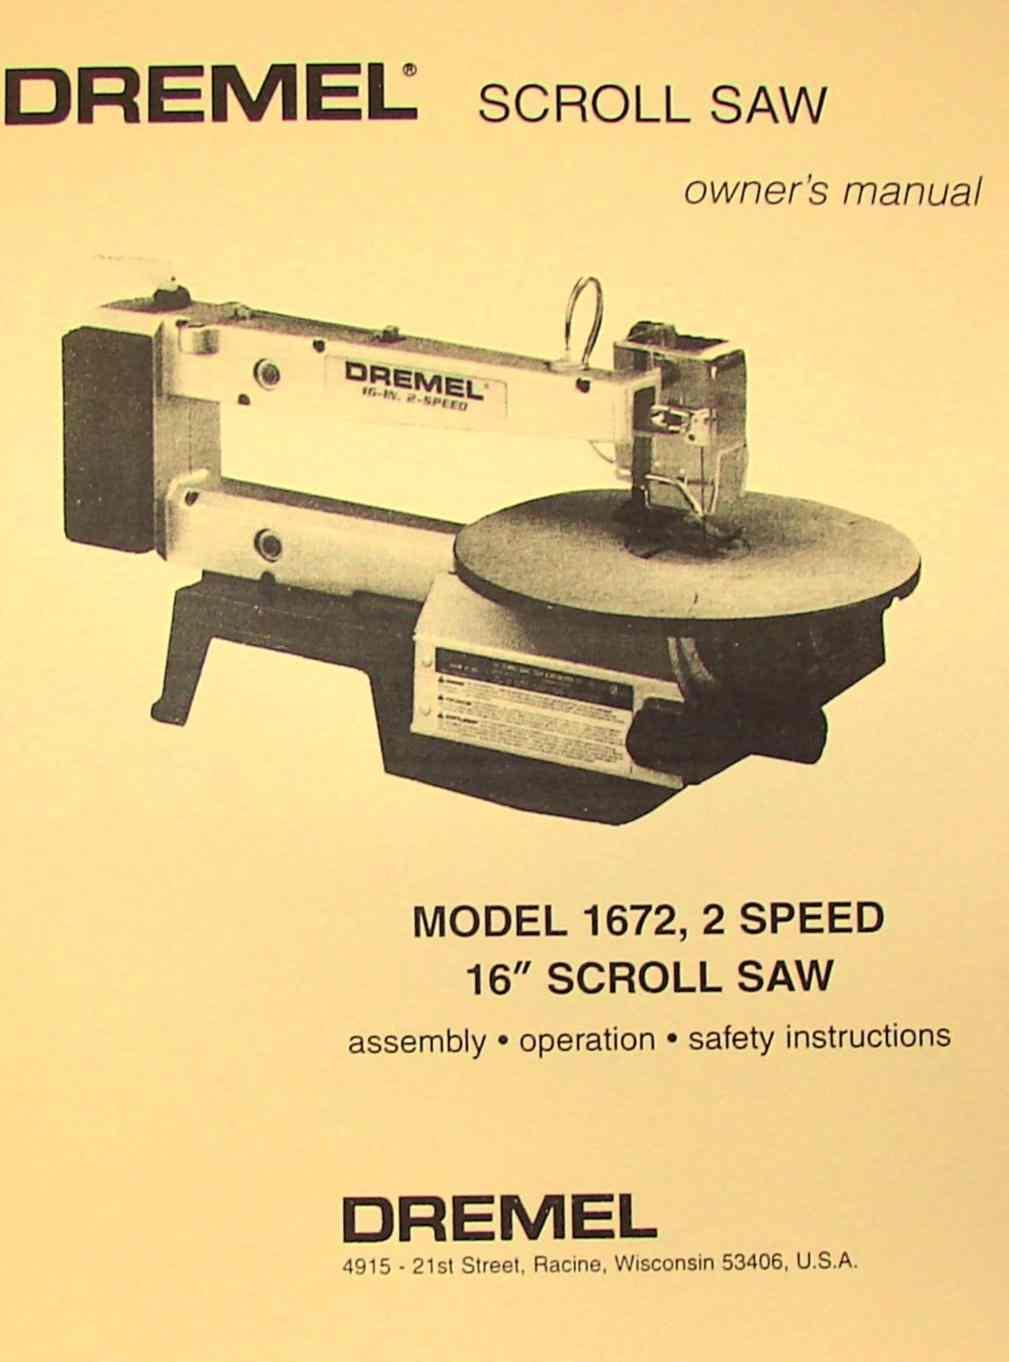 "DREMEL Model 1672 16"" Scroll Saw Owner's & Parts Manual | Ozark Tool Manuals & Books"